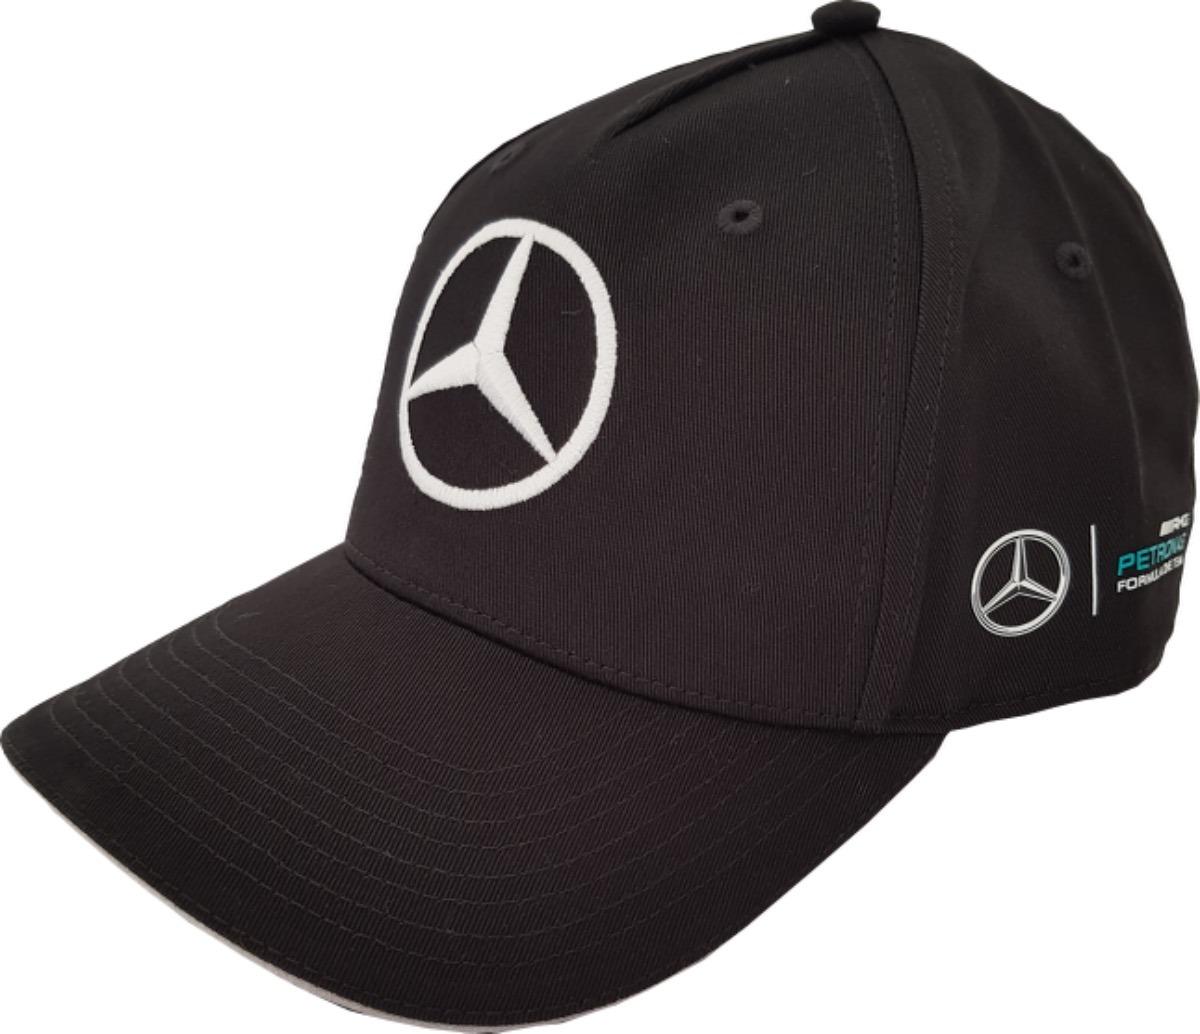 Gorra mercedes benz mapm team cap original importada cargando zoom jpg  1200x1034 Mercedes benz baseball caps a196a0546cd